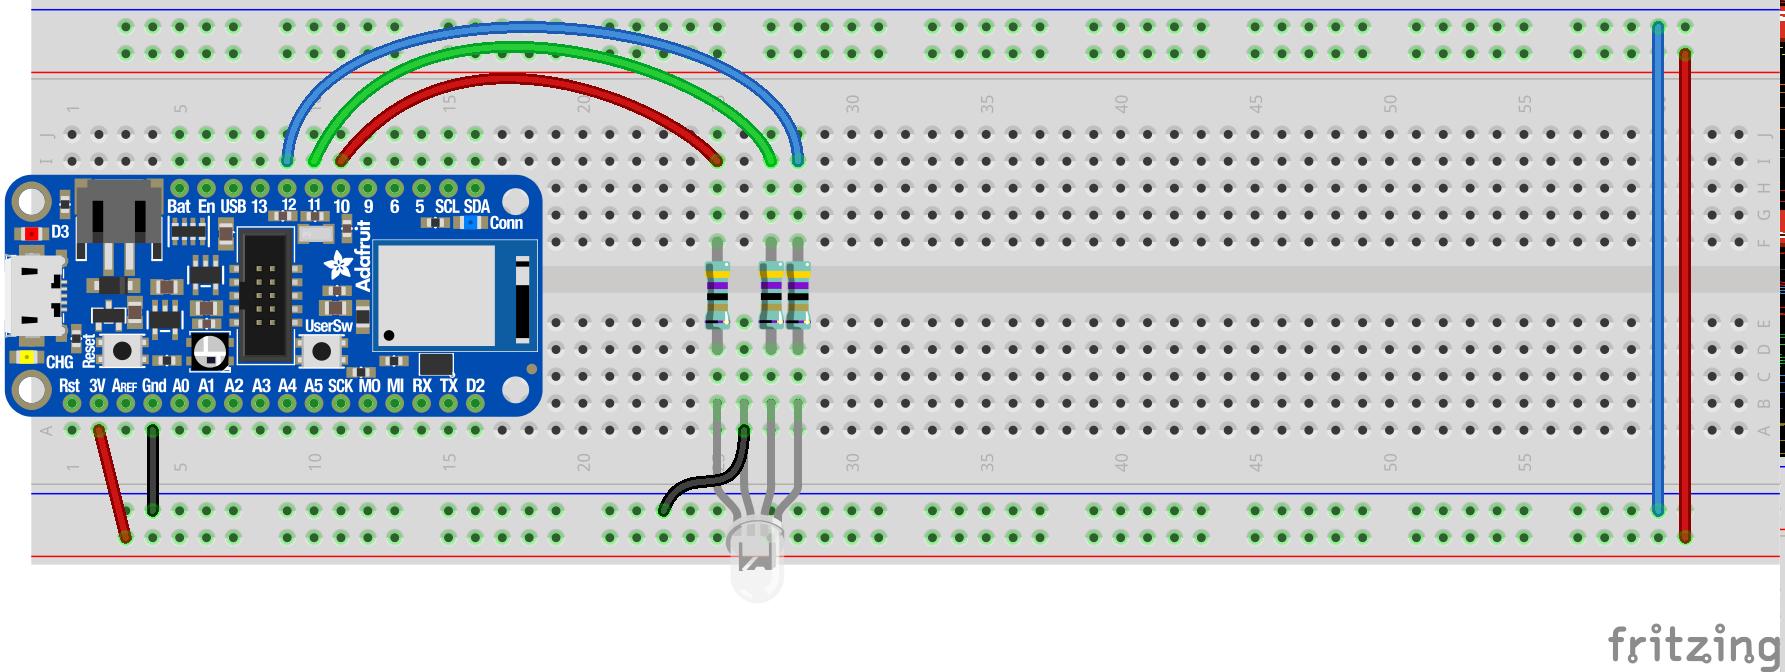 Schaltplan mit RGB-LED